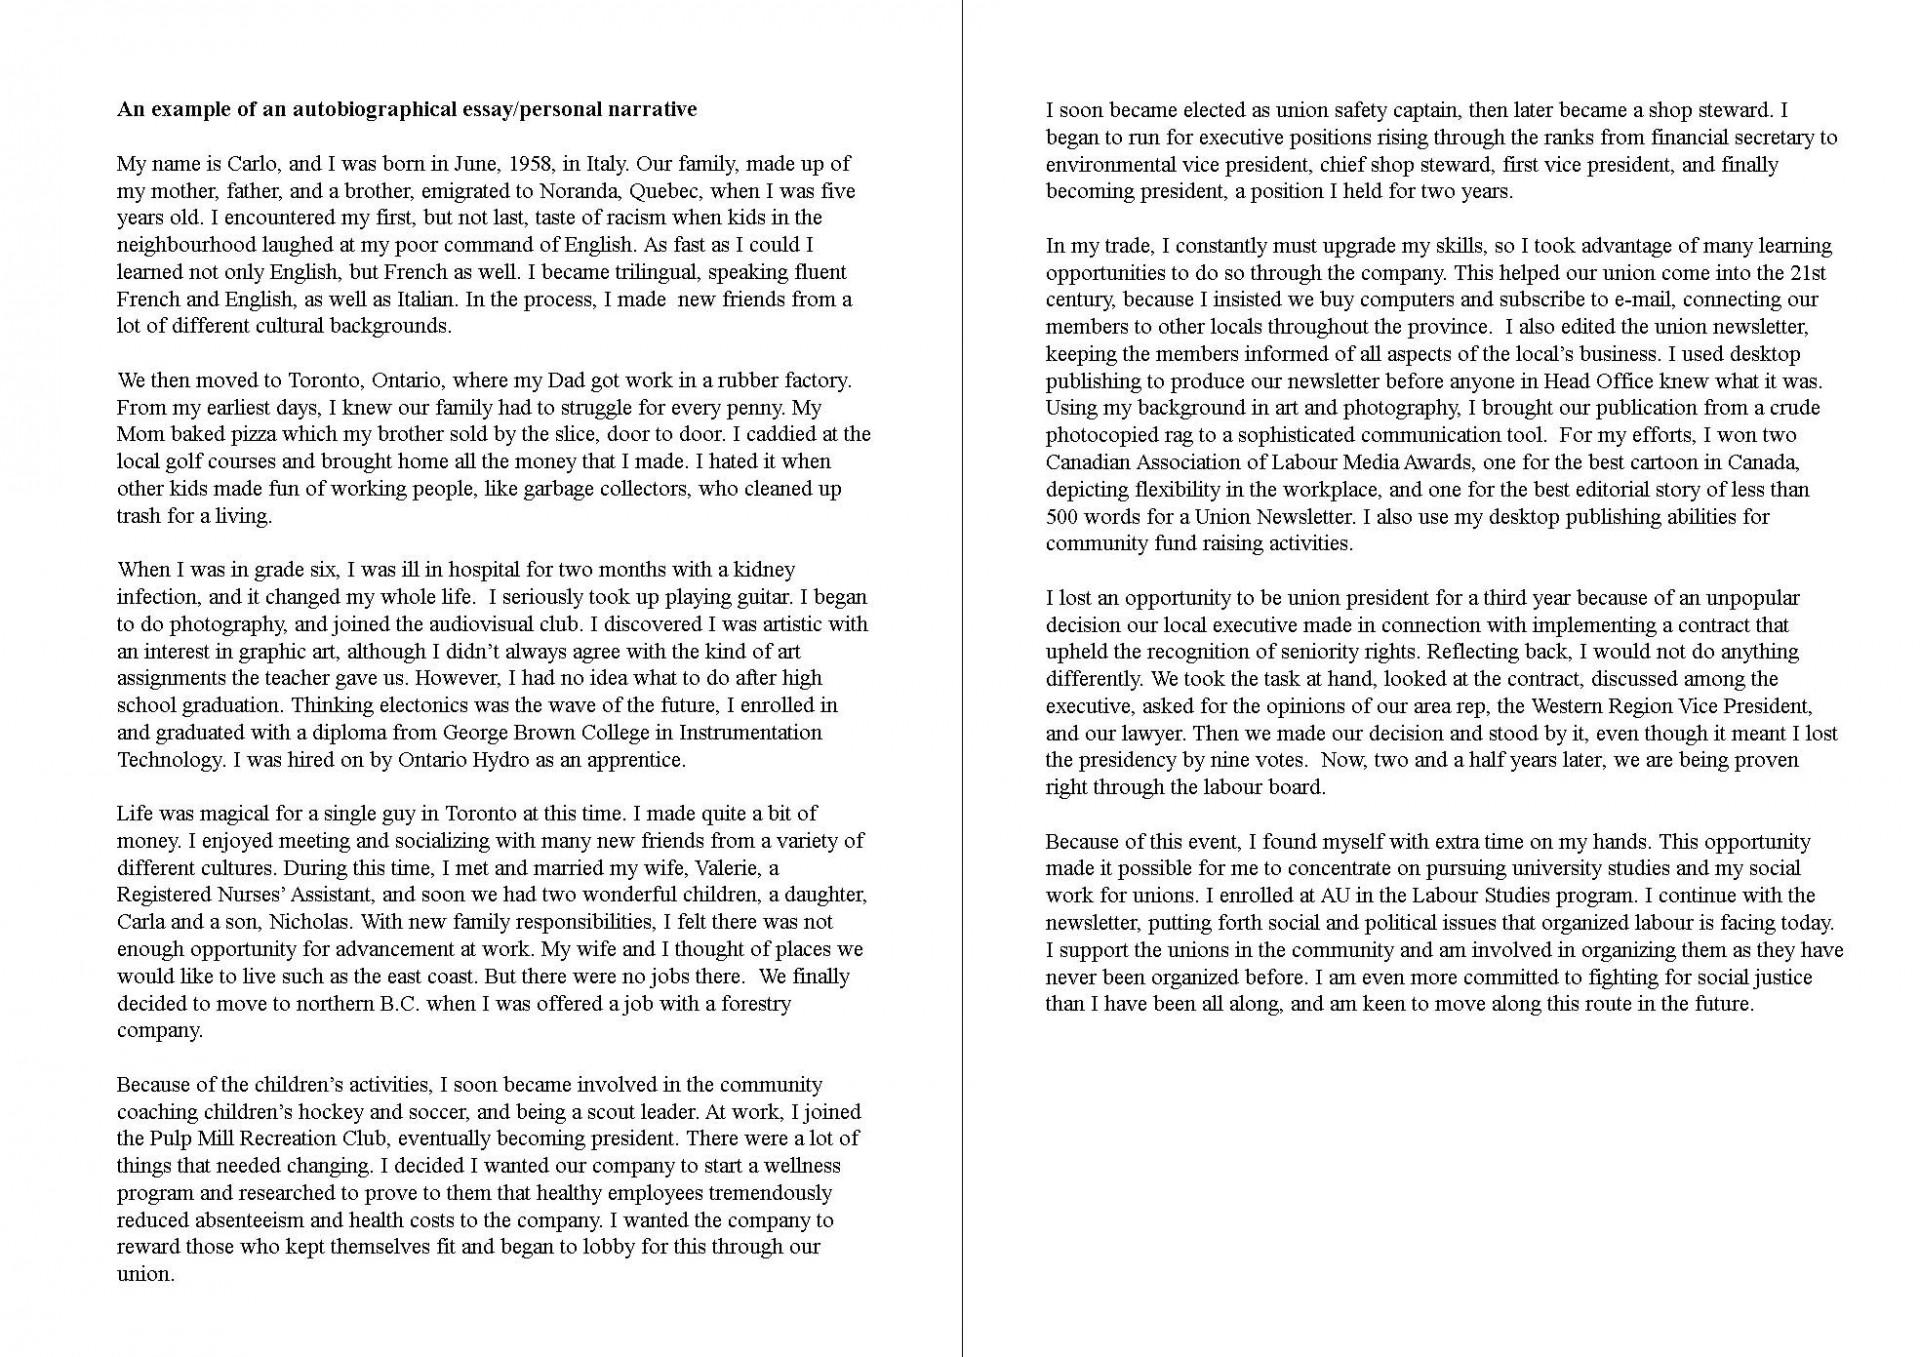 003 Essay Example Random Generator Stunning Postmodern Prompt 1920